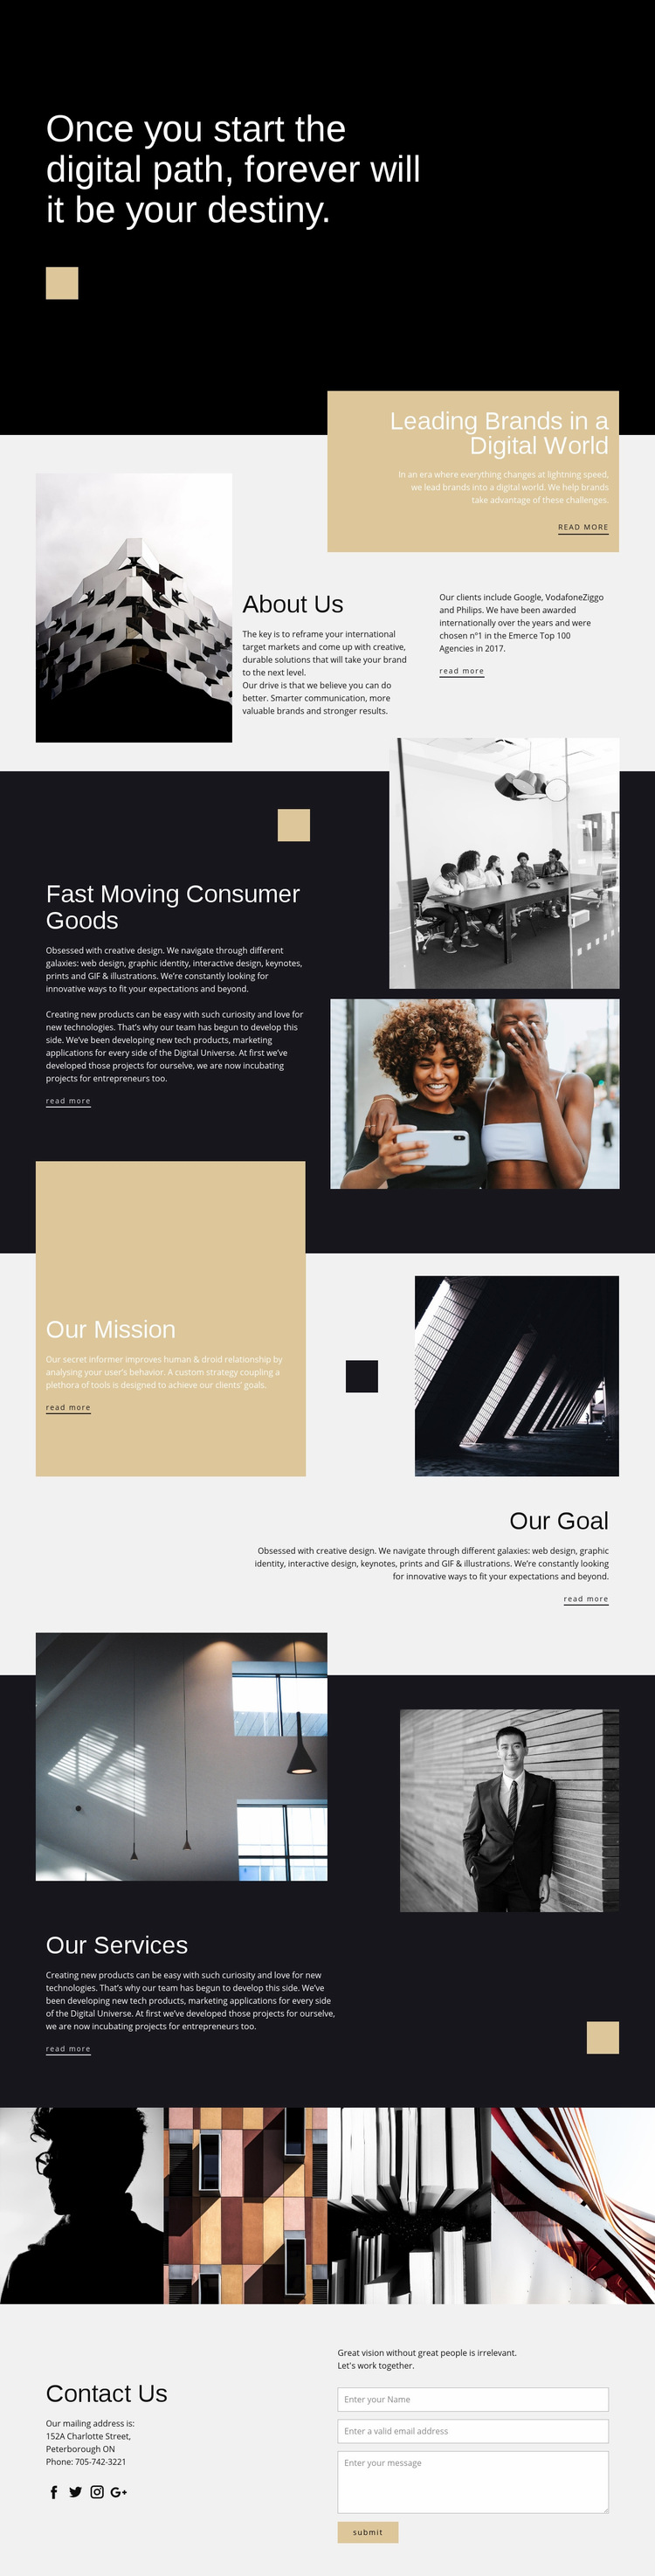 Destiny photo studio Web Page Design